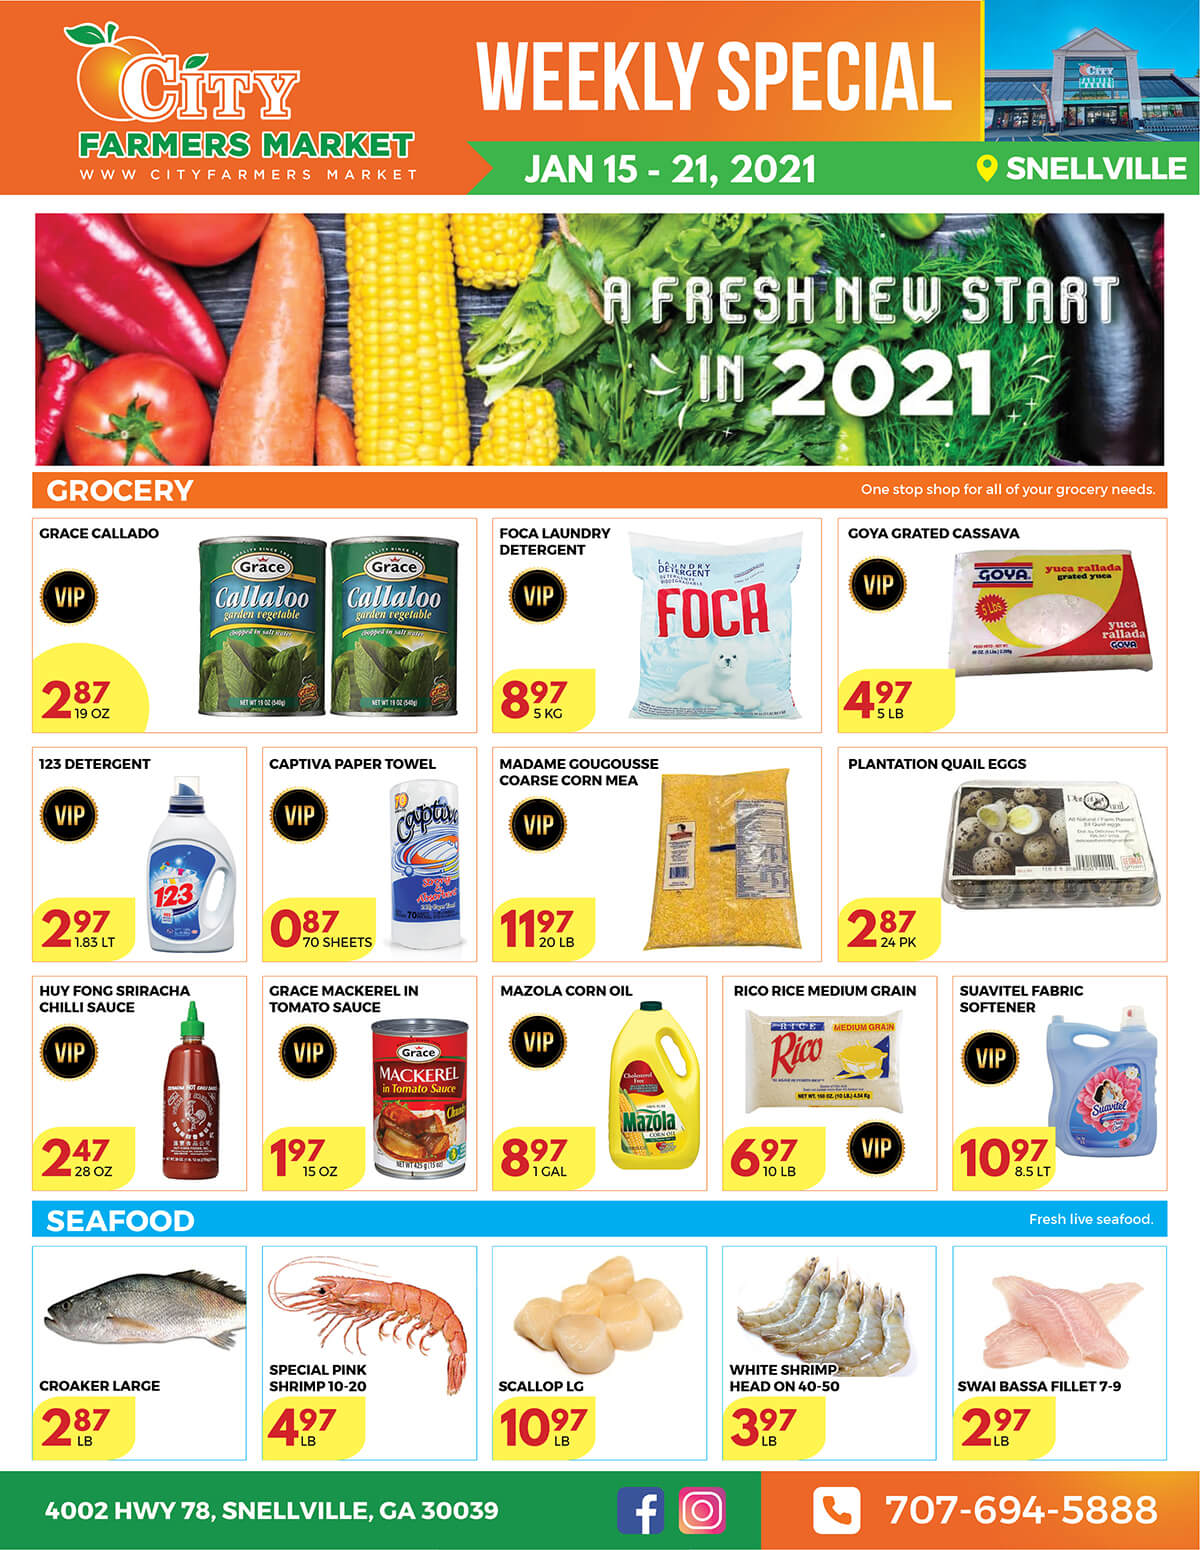 [object object] Weekly Special – CFM#3 @ Snellville City Farmers Market International Supermarket in Georgia CFM3 Snellville Front